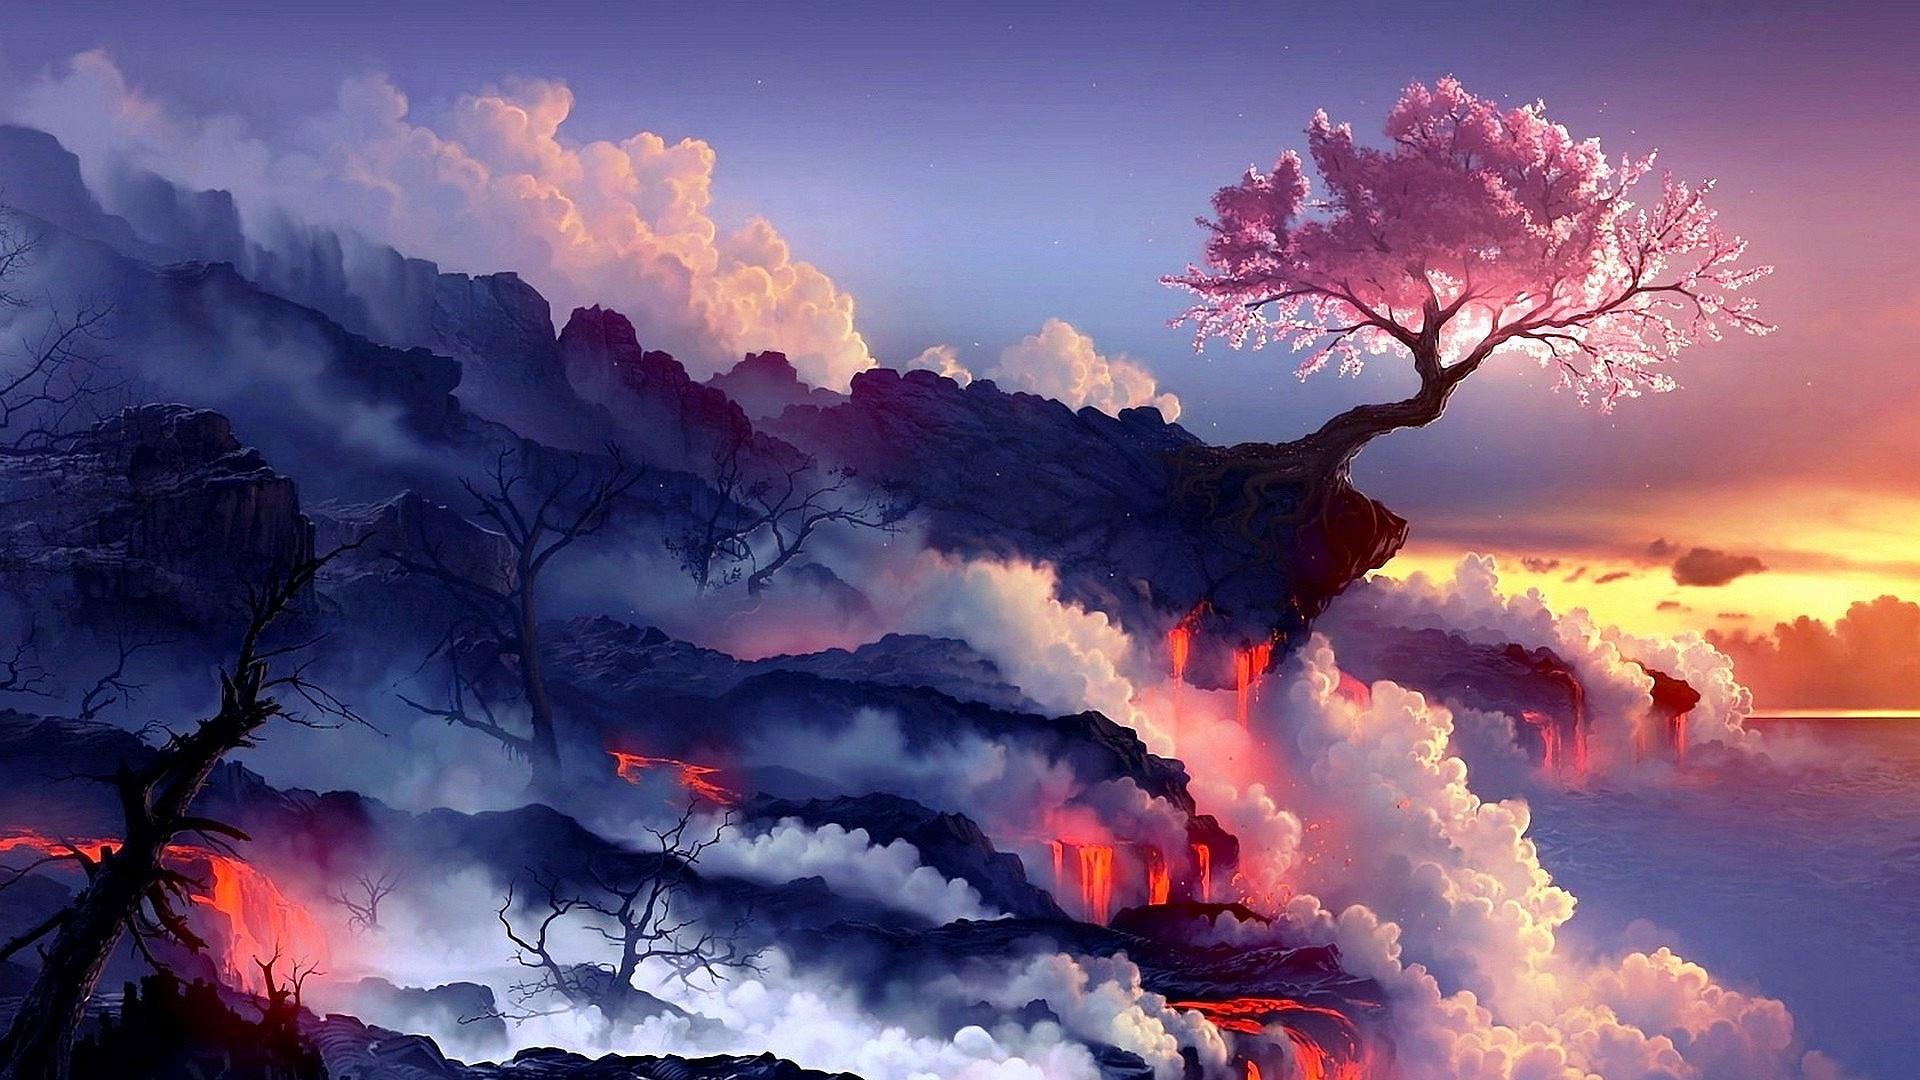 Fantasy Volcano Wallpaper 20288 1920x1080px 1920x1080